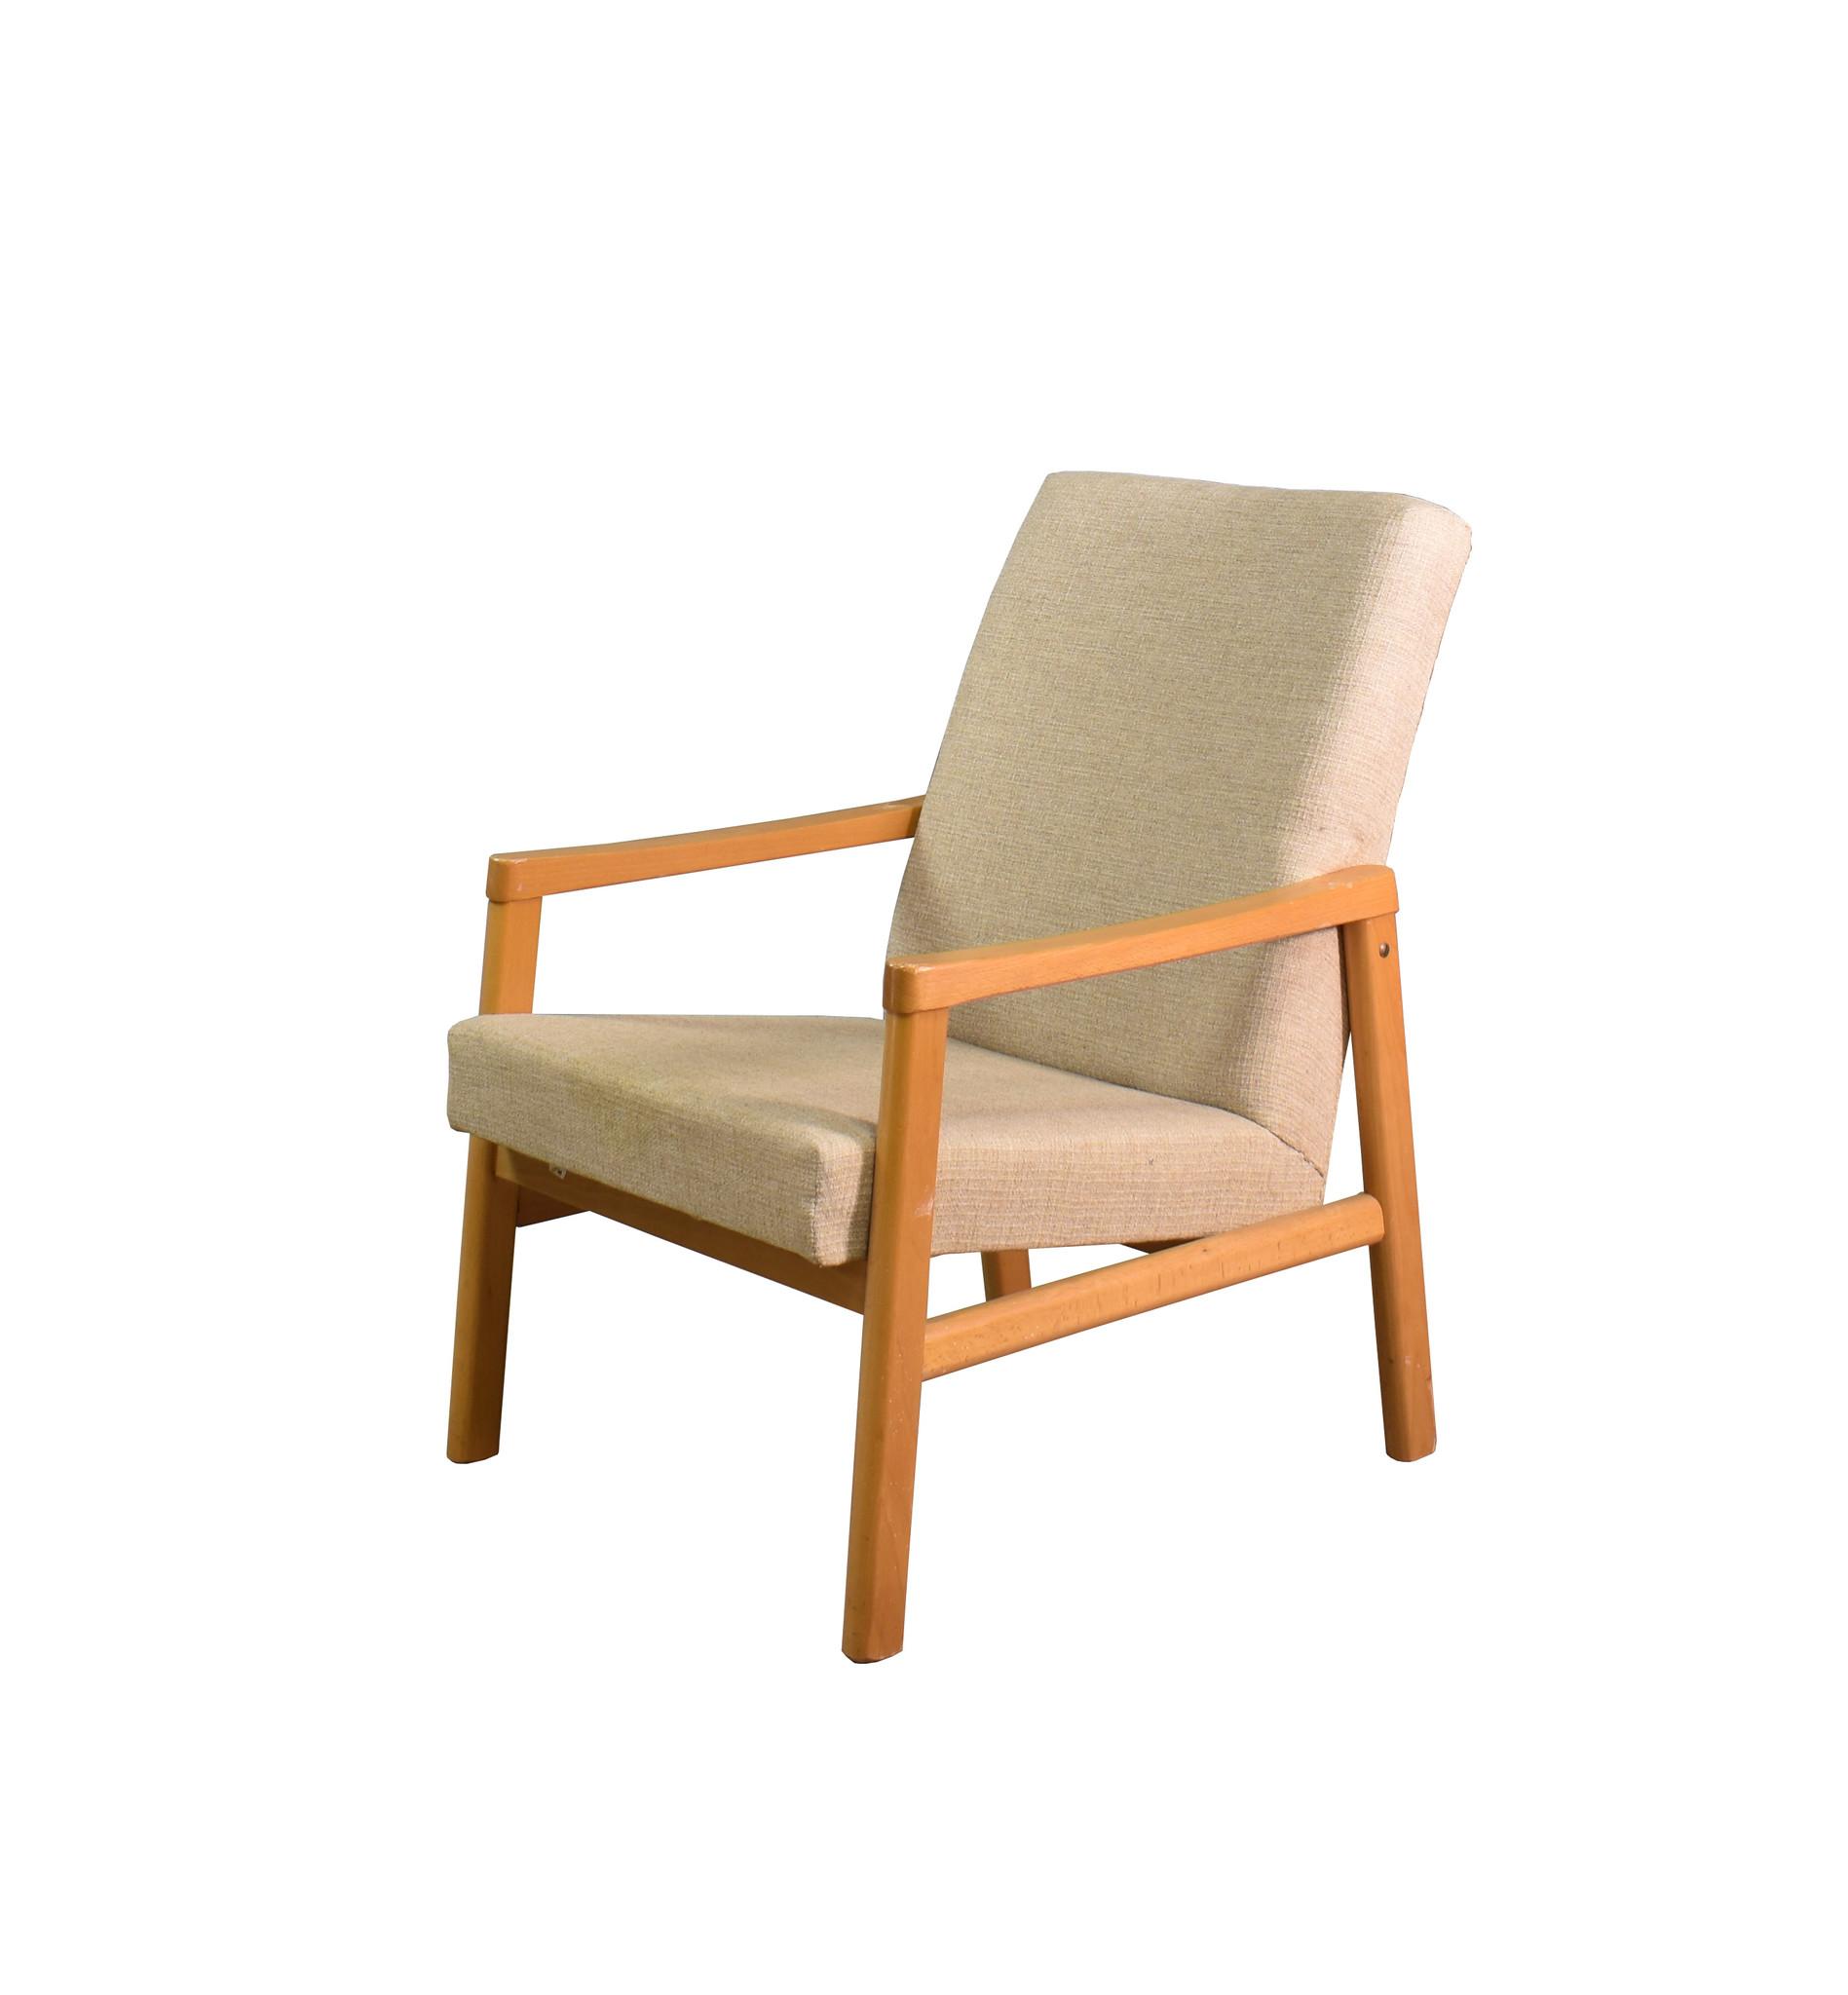 Eetkamerstoel Vintage design stoelen